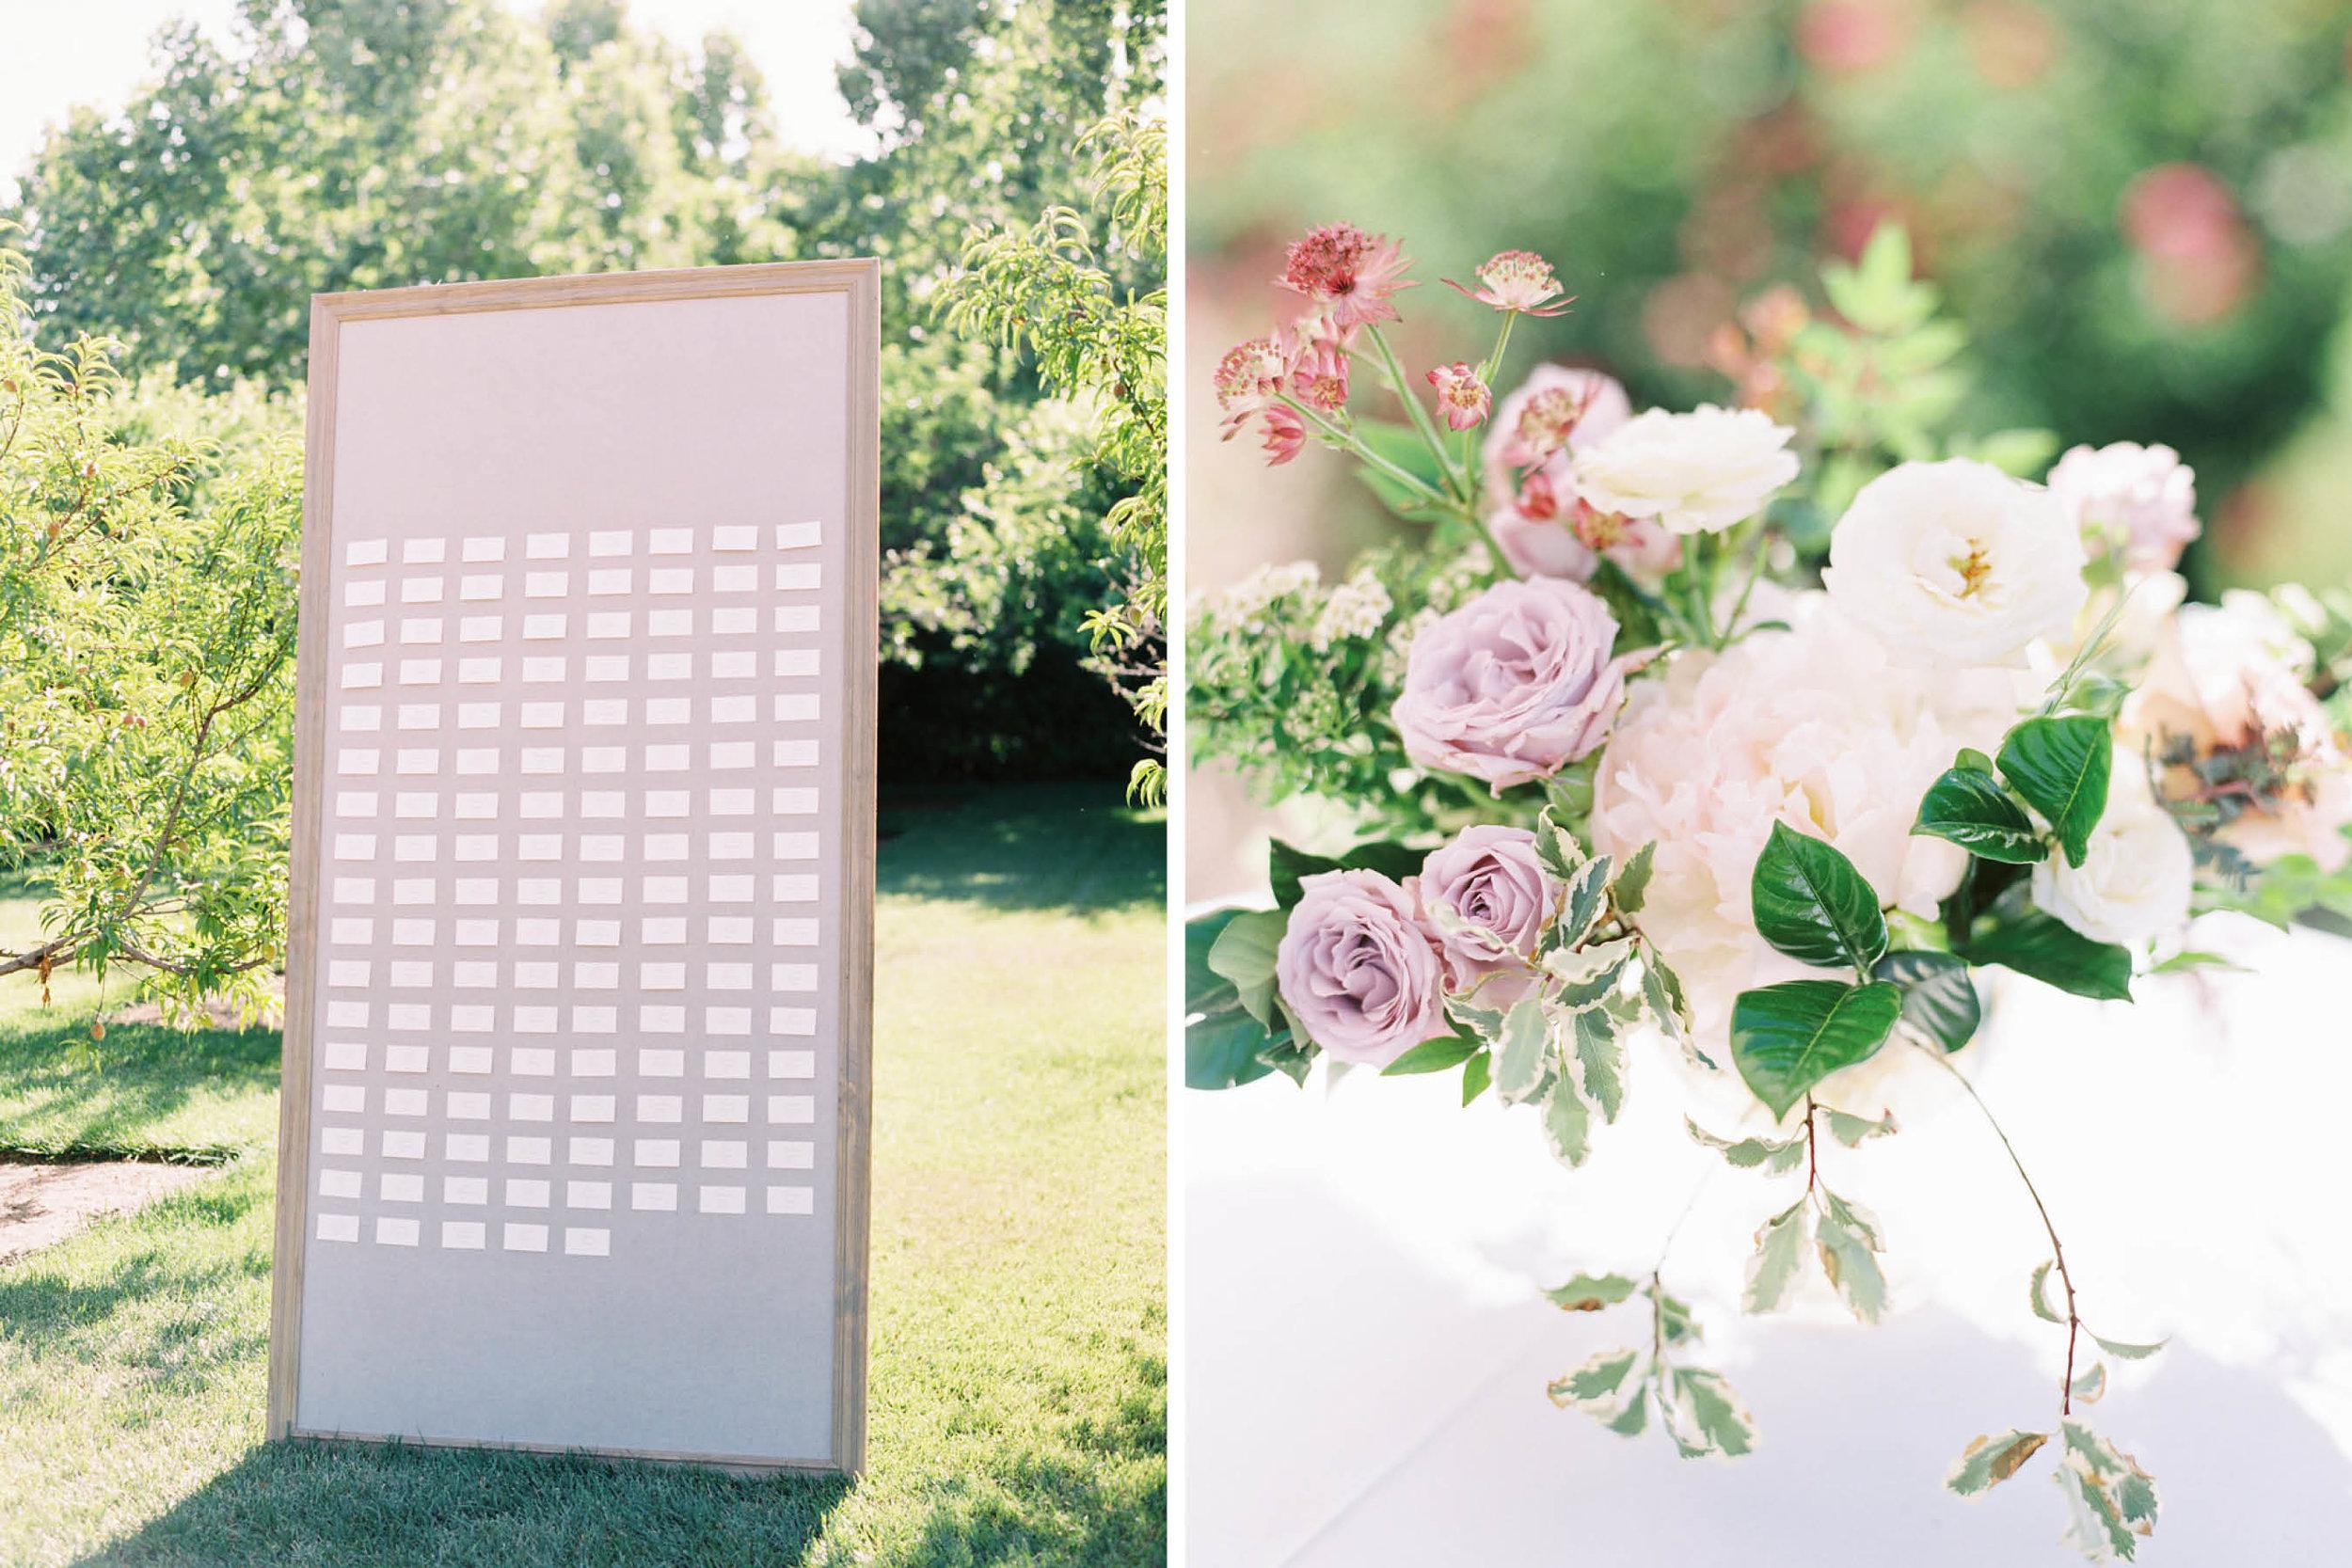 alegria-by-design-wedding-planner-planning-event-design-santa-barbara-day-of-coordinator-kestrel-park-santa-ynez-fields-castle-lavender-garden-mrs-box (31).jpg